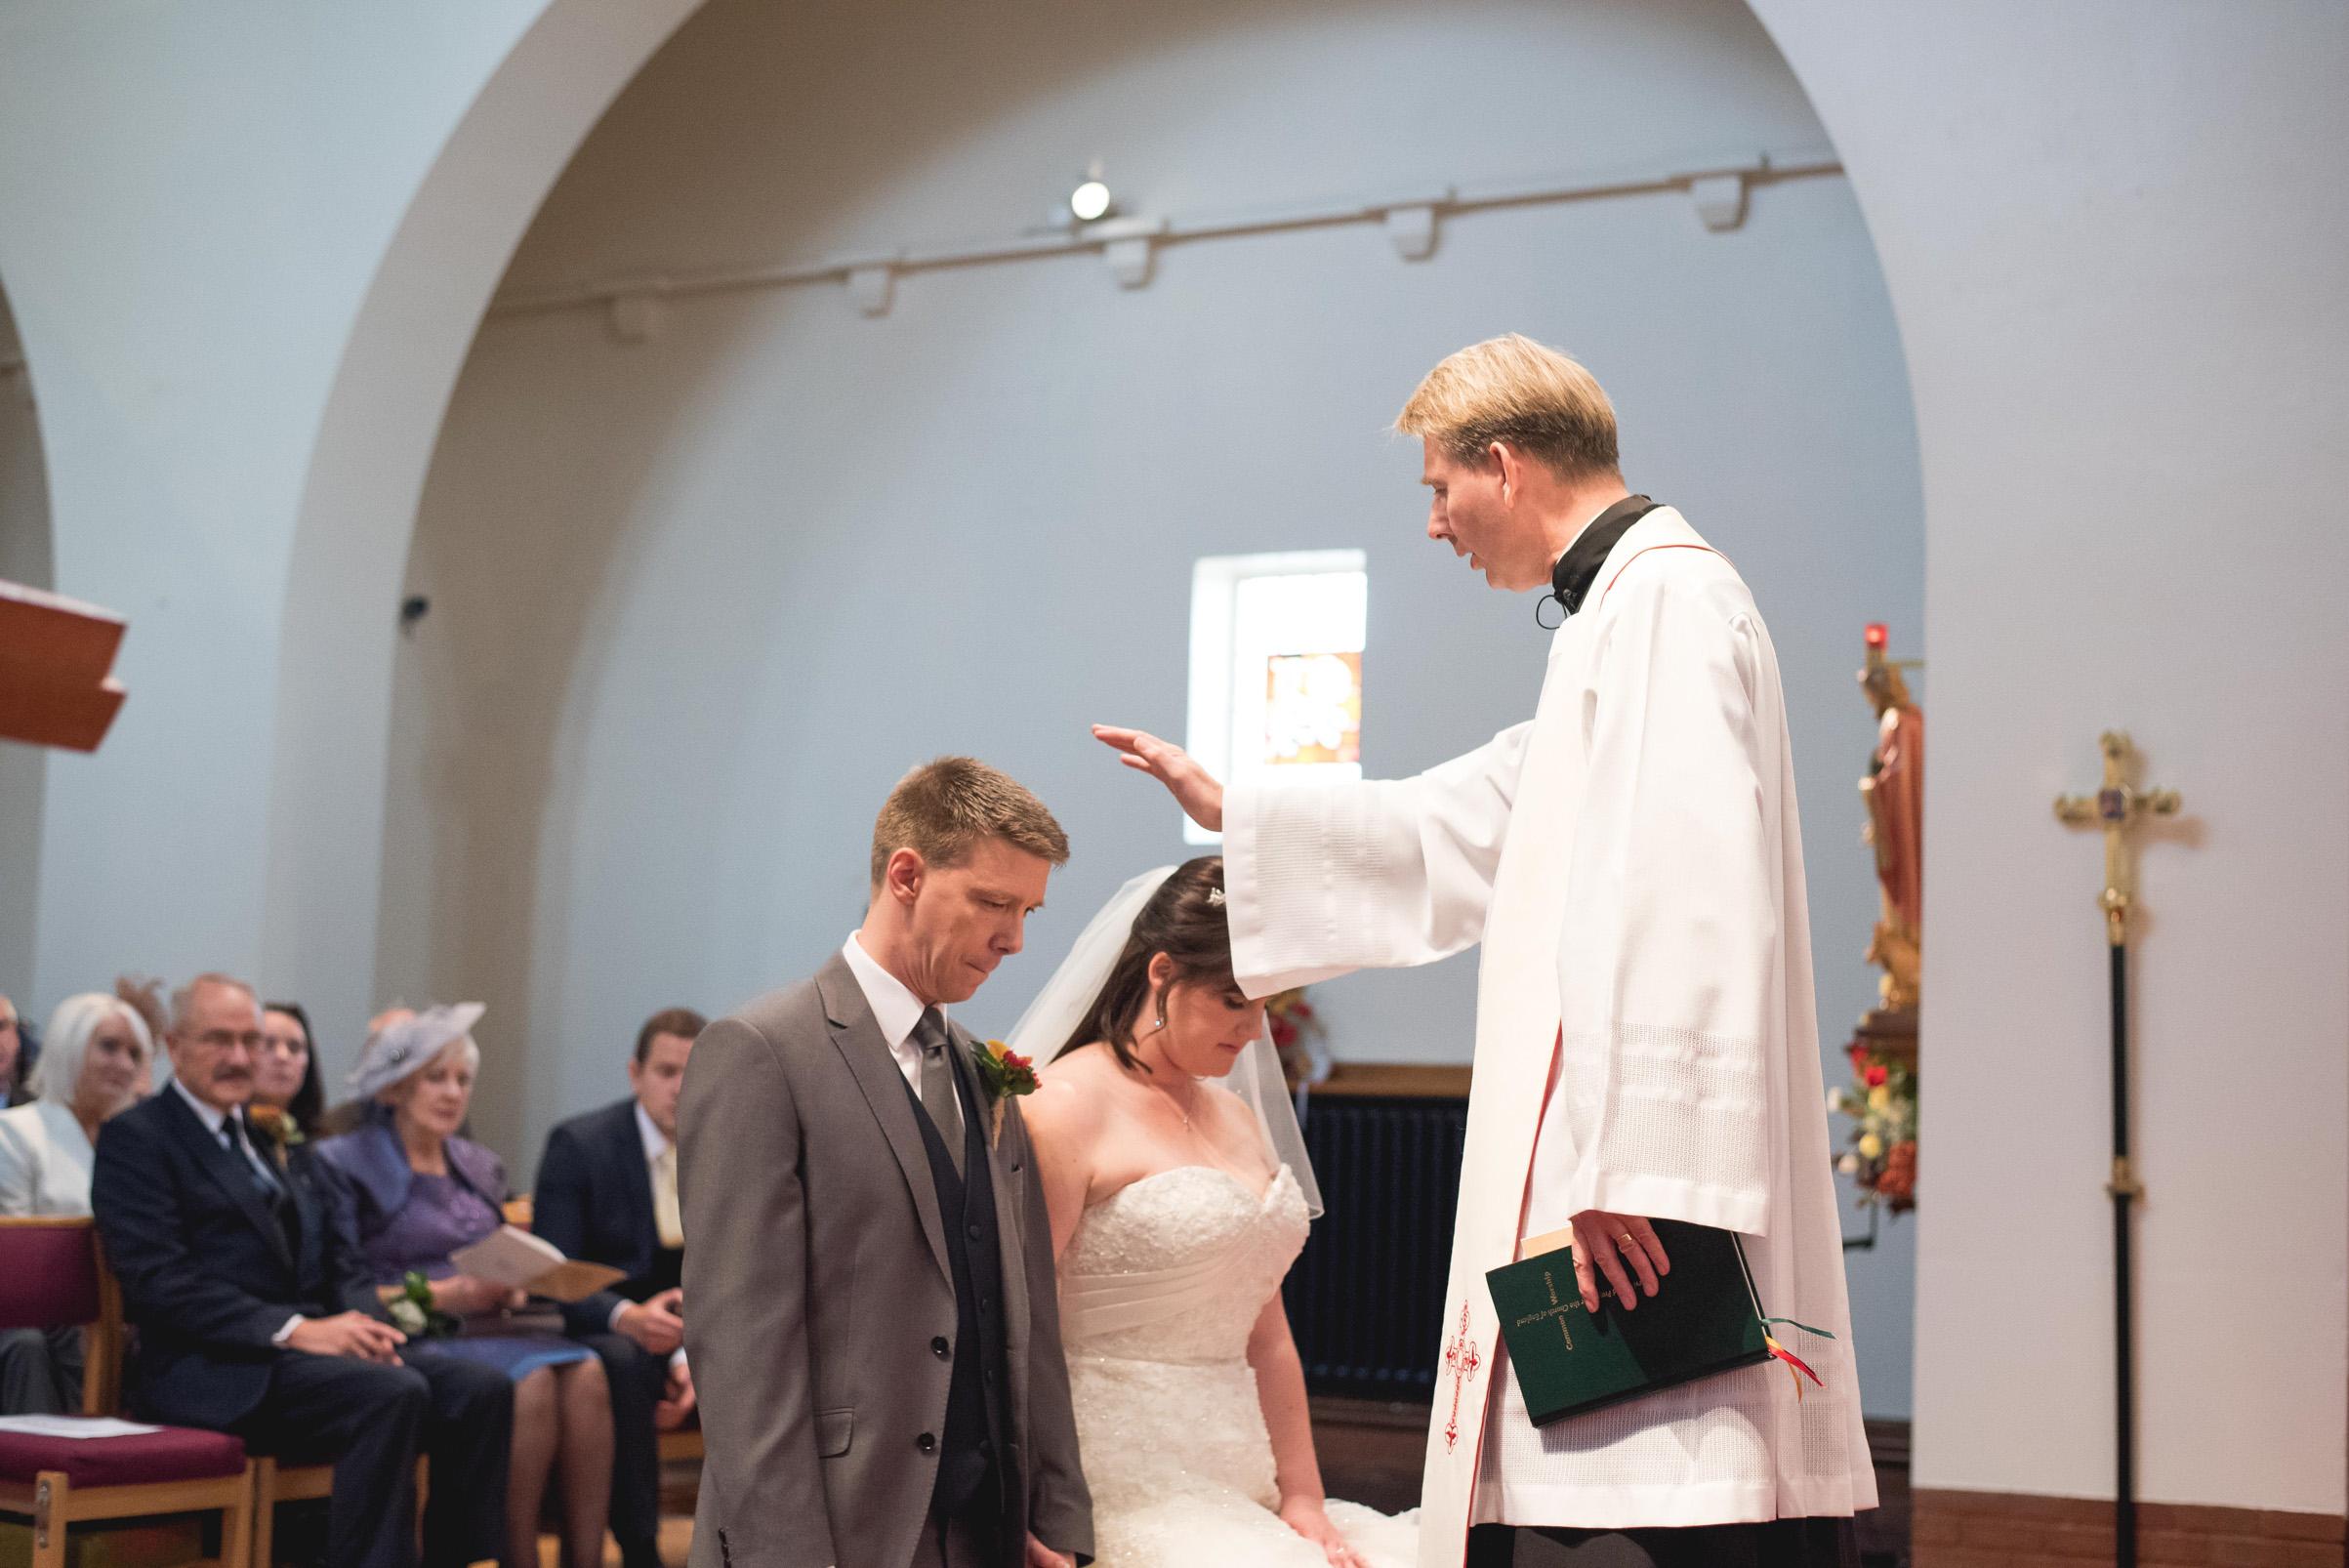 The+Fairlawns+wedding+Aldridge+StLukes+Church-99.jpg